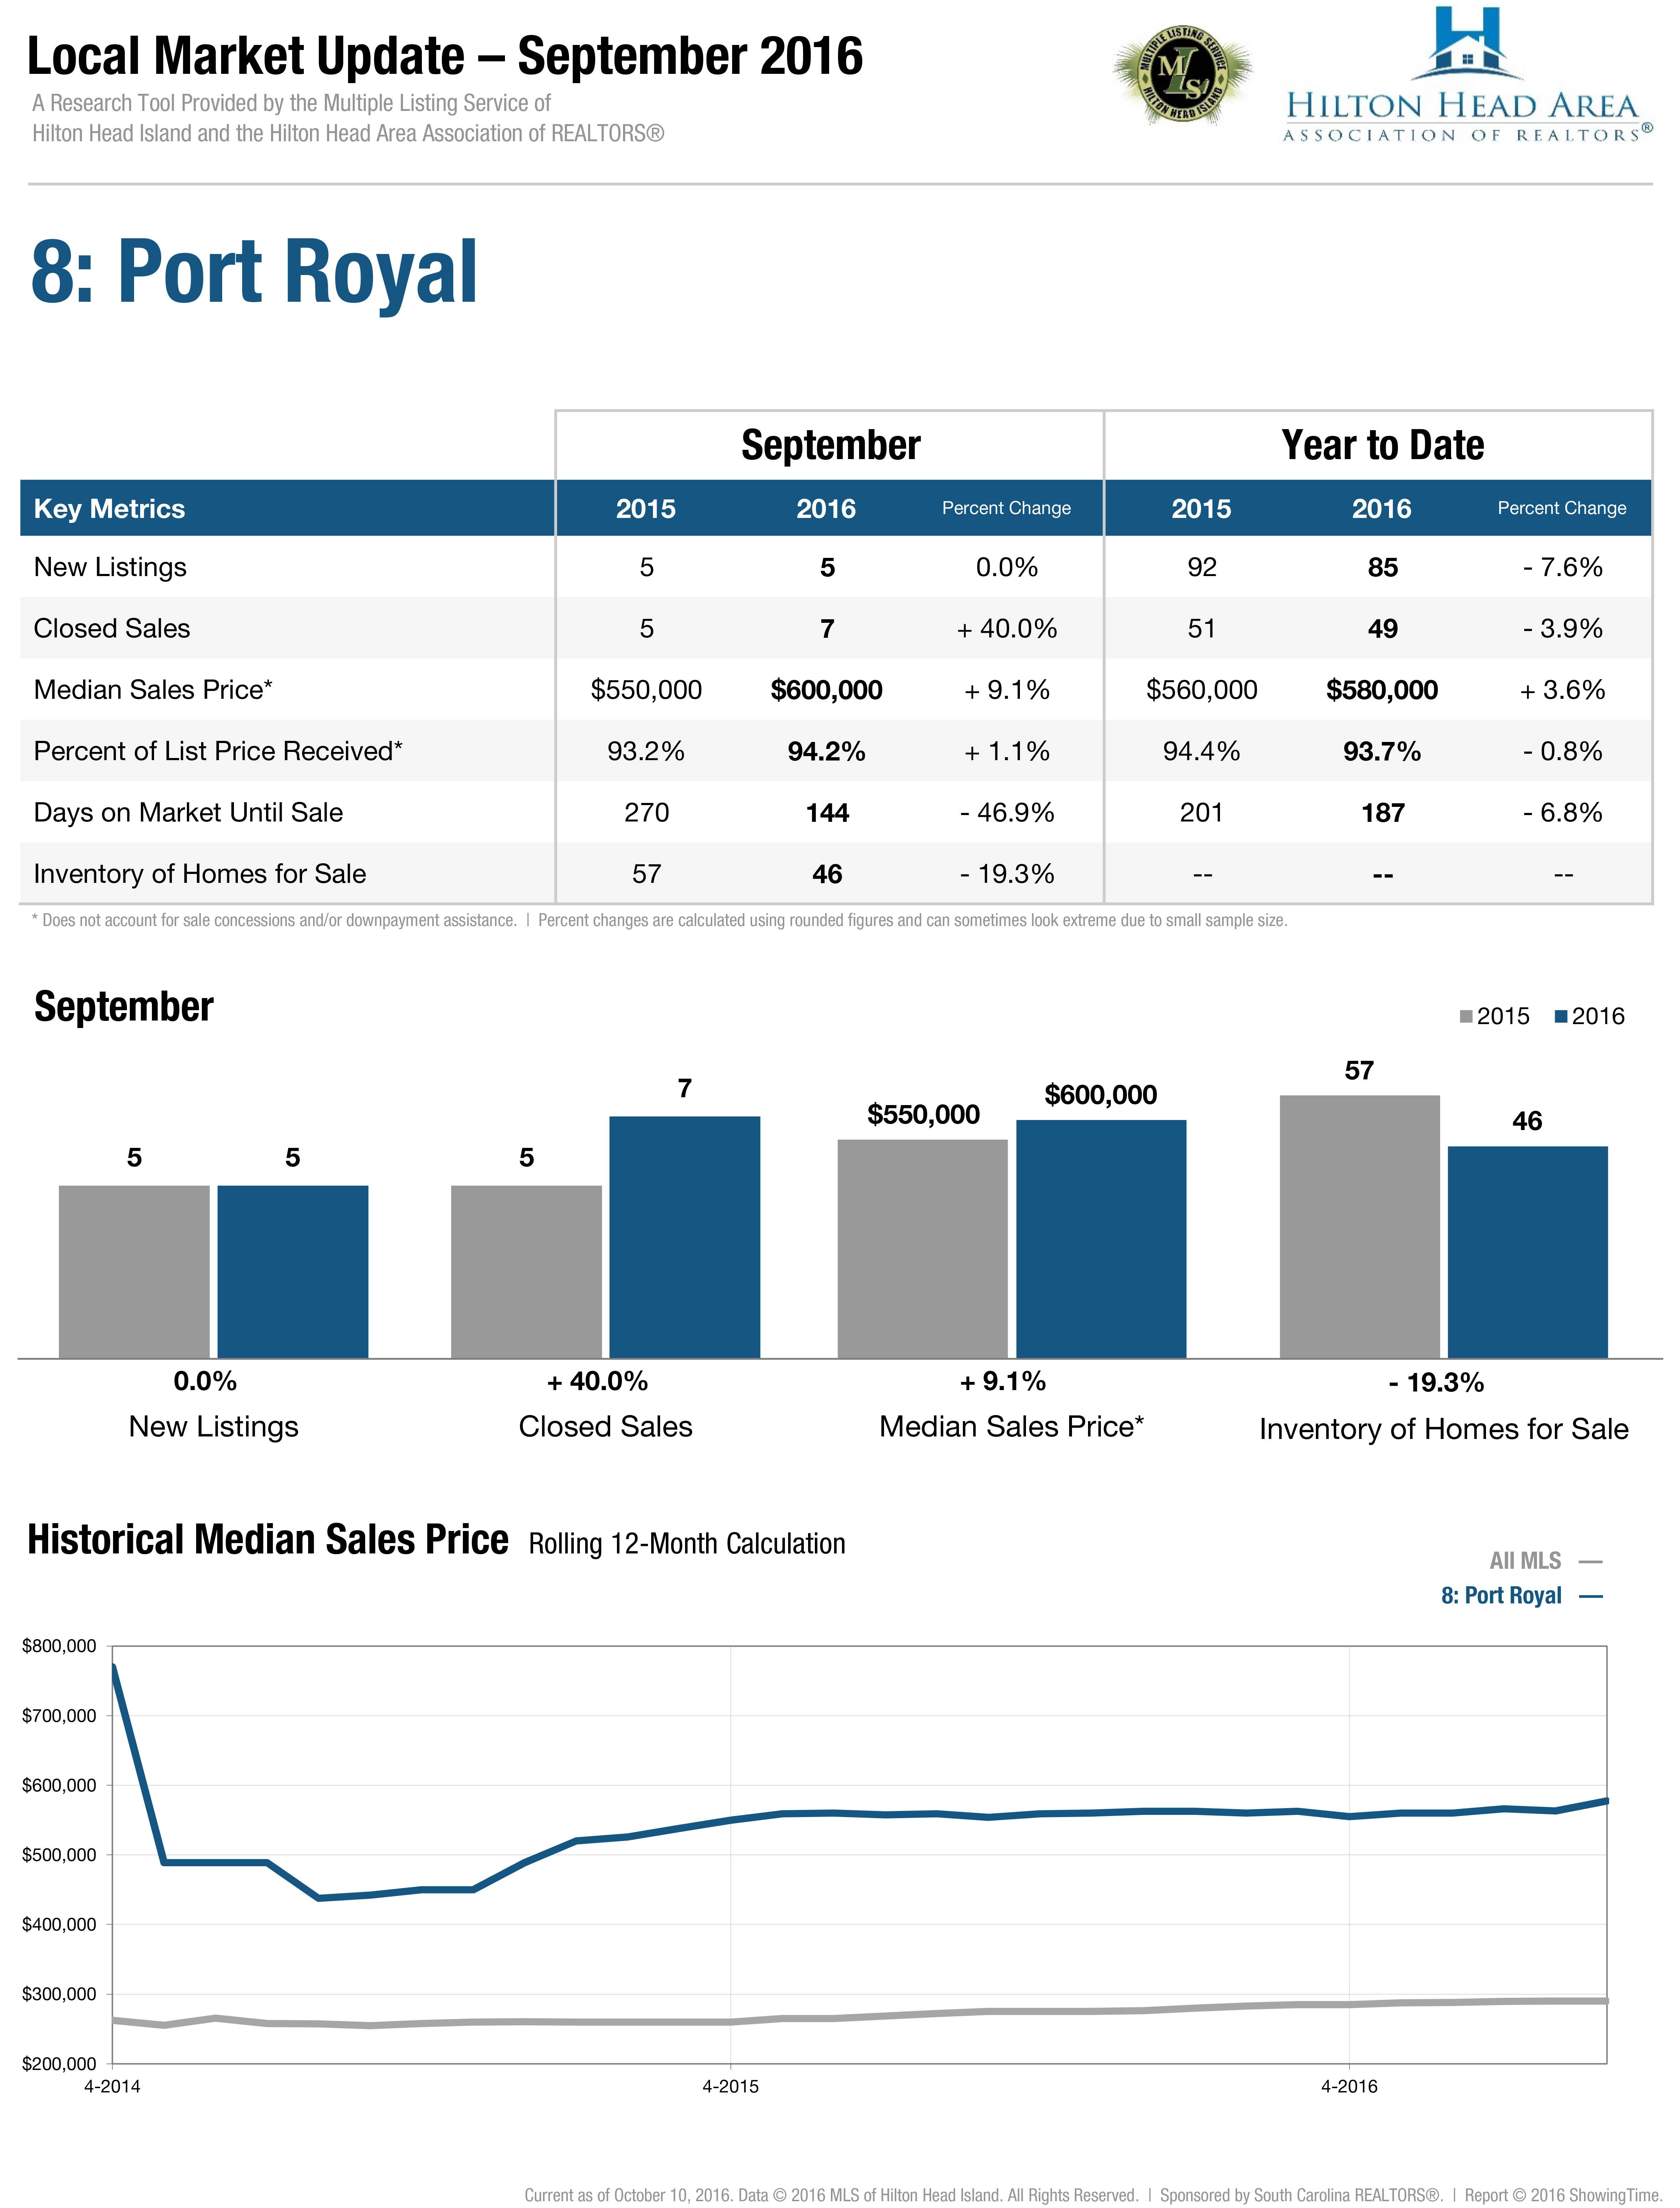 8: Port Royal